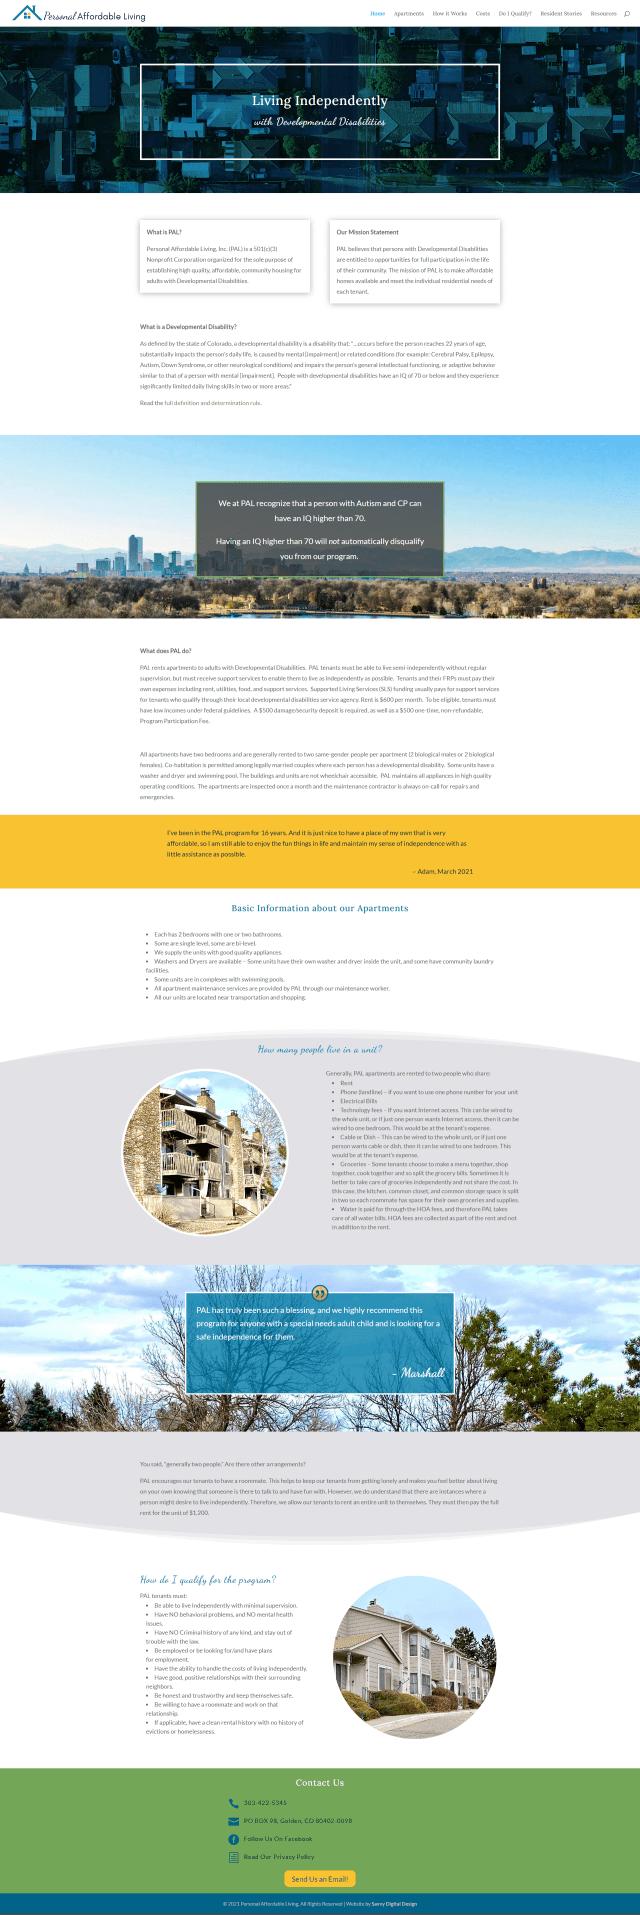 screenshot of PAL website page 1